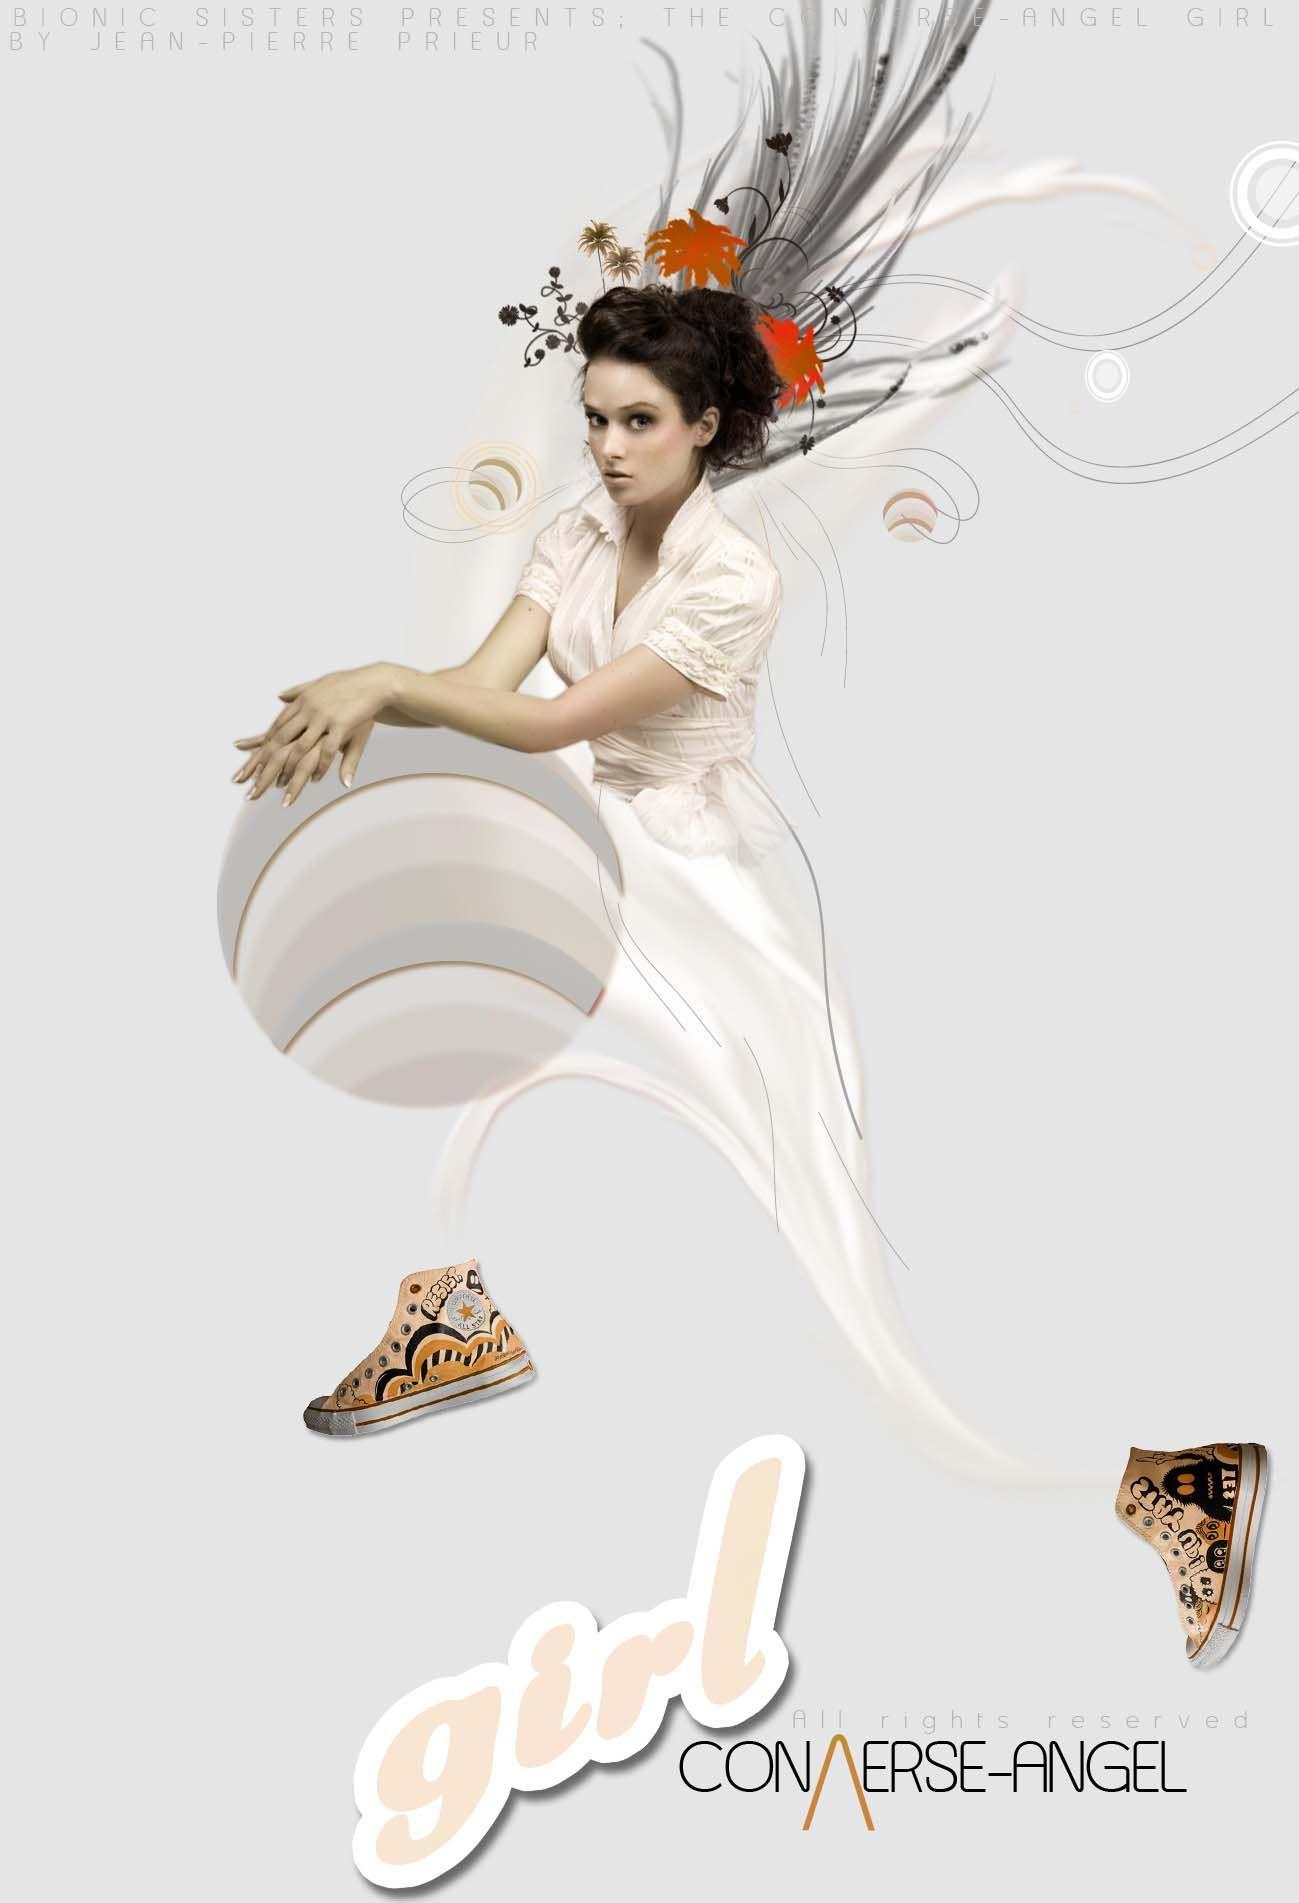 Fashion Poster Design Party Sponsorship Proposal Blank Roster  Fb41296f78a39260bf667de5640b4ae2 Fashion Poster Designhtml  Fashion Poster Design